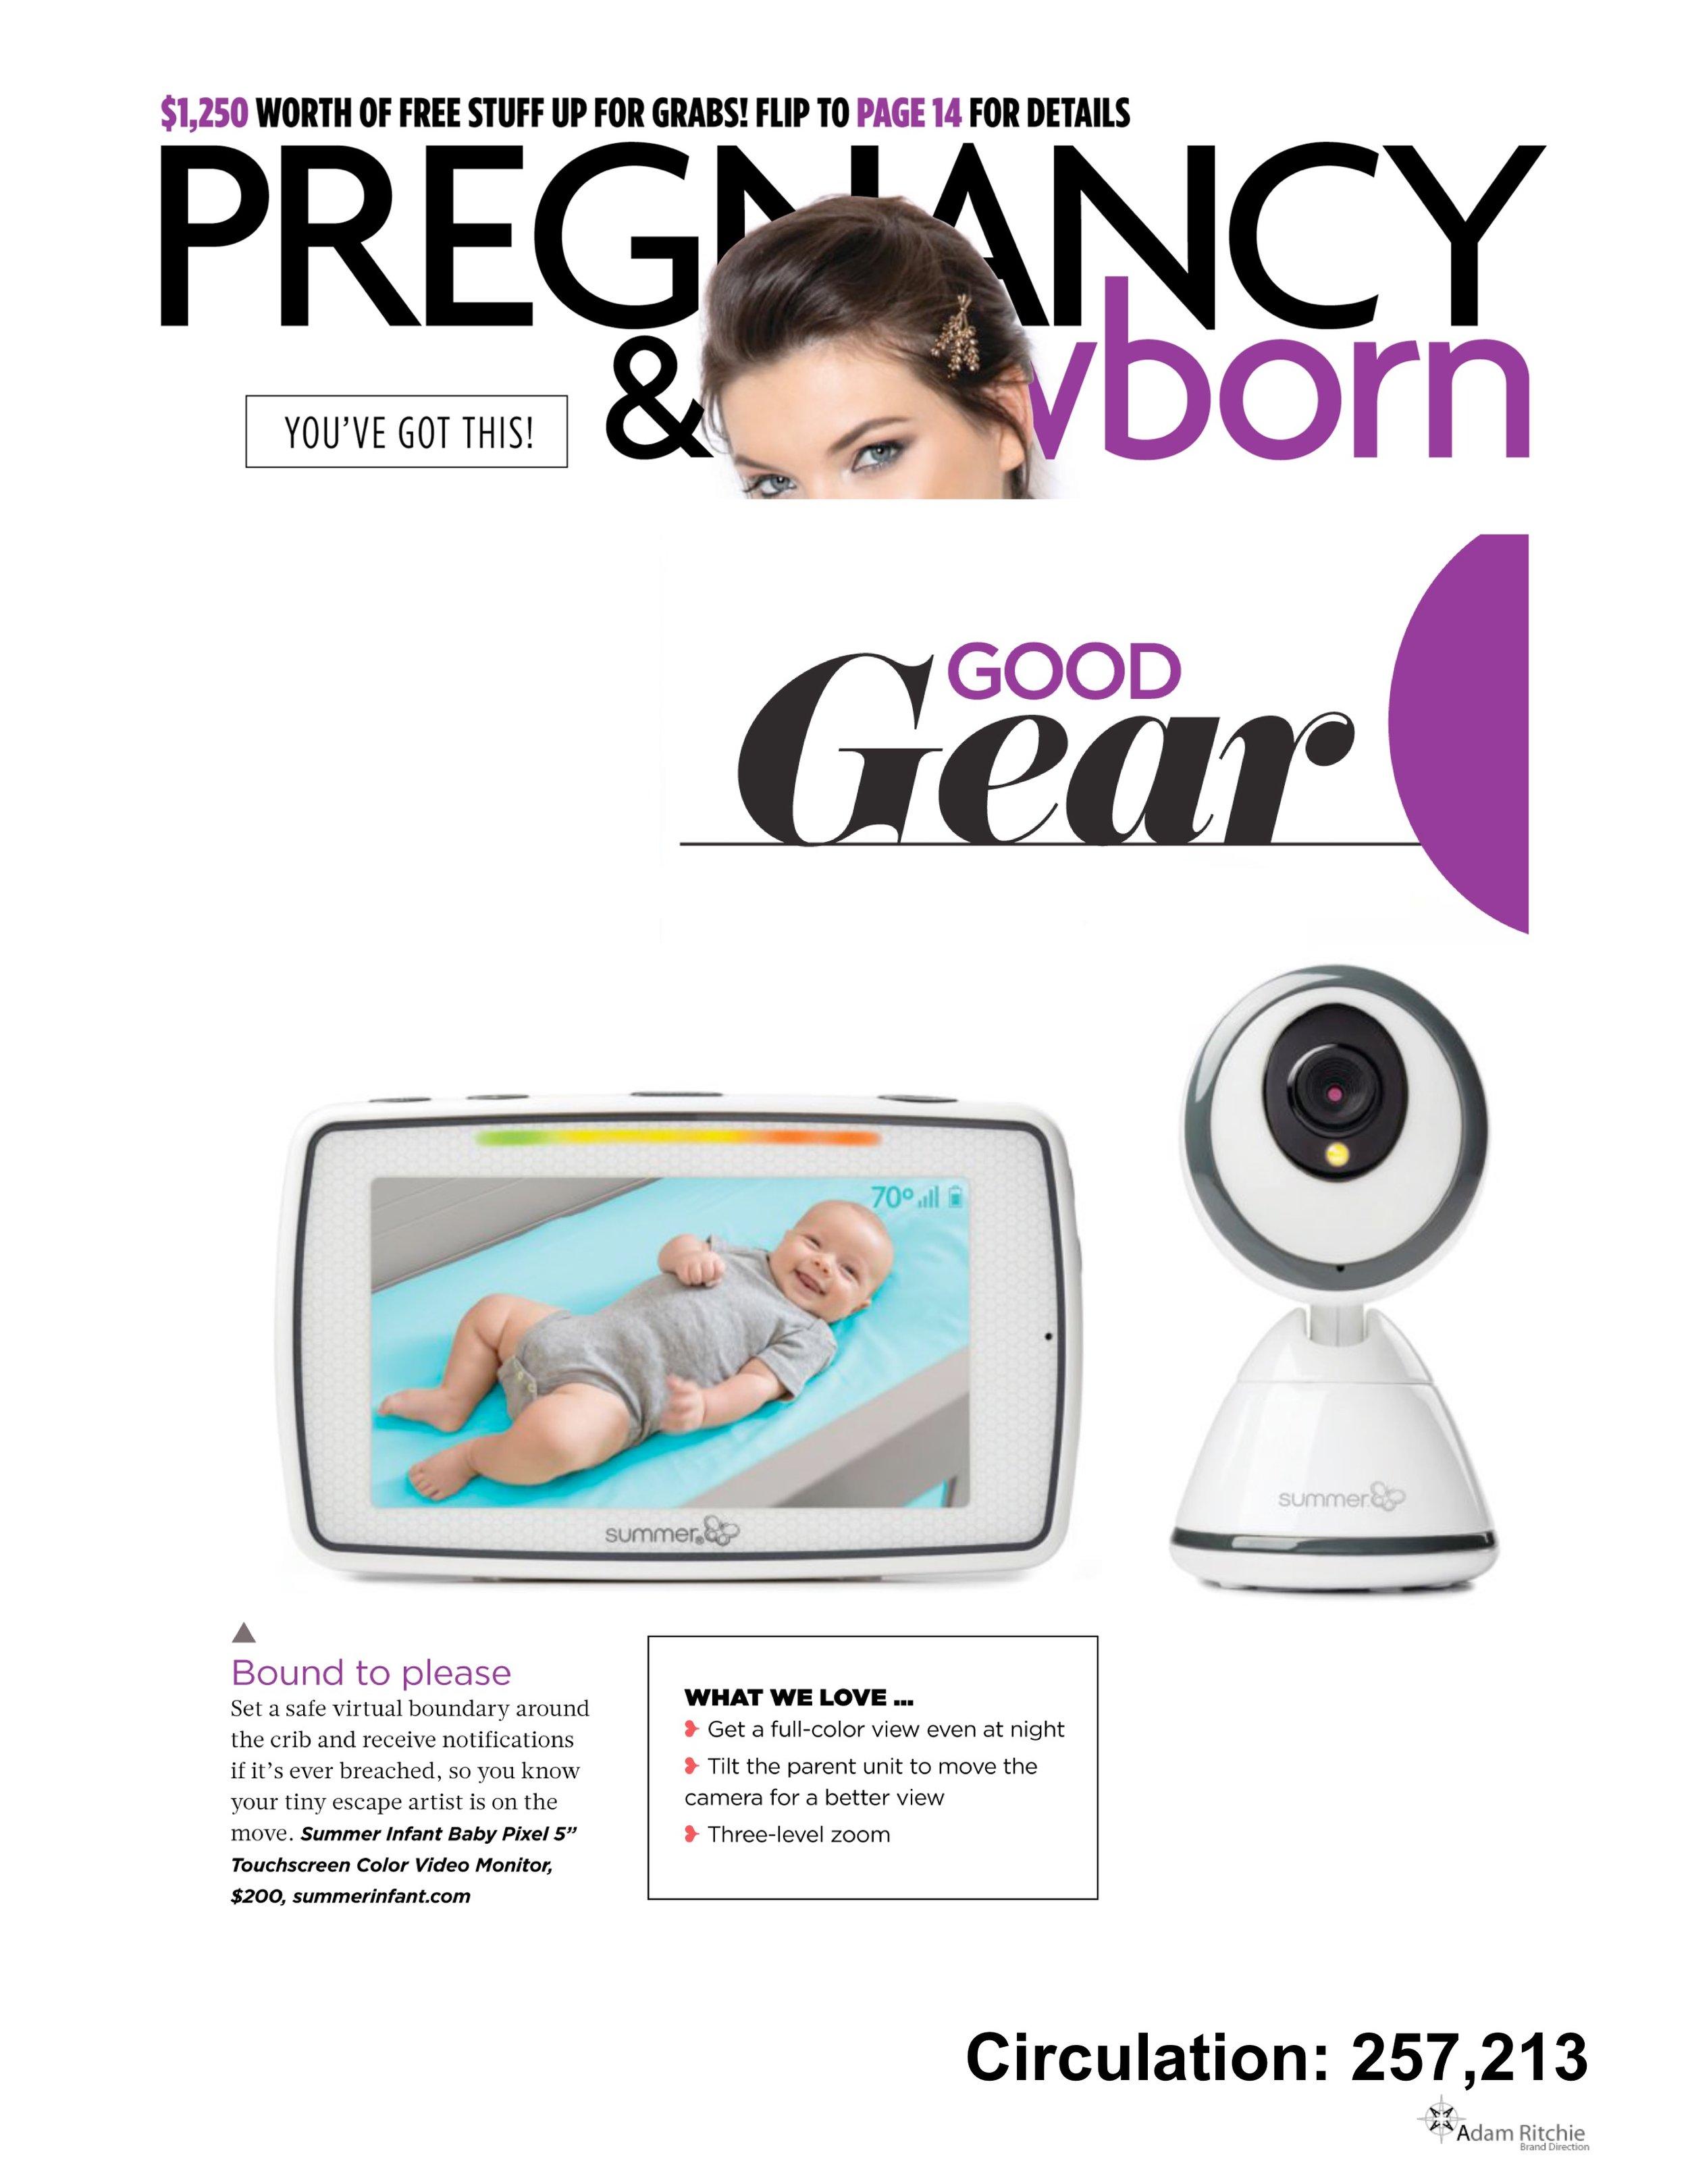 2018.06.00_Pregnancy & Newborn_Summer Infant Baby Pixel monitor.jpeg